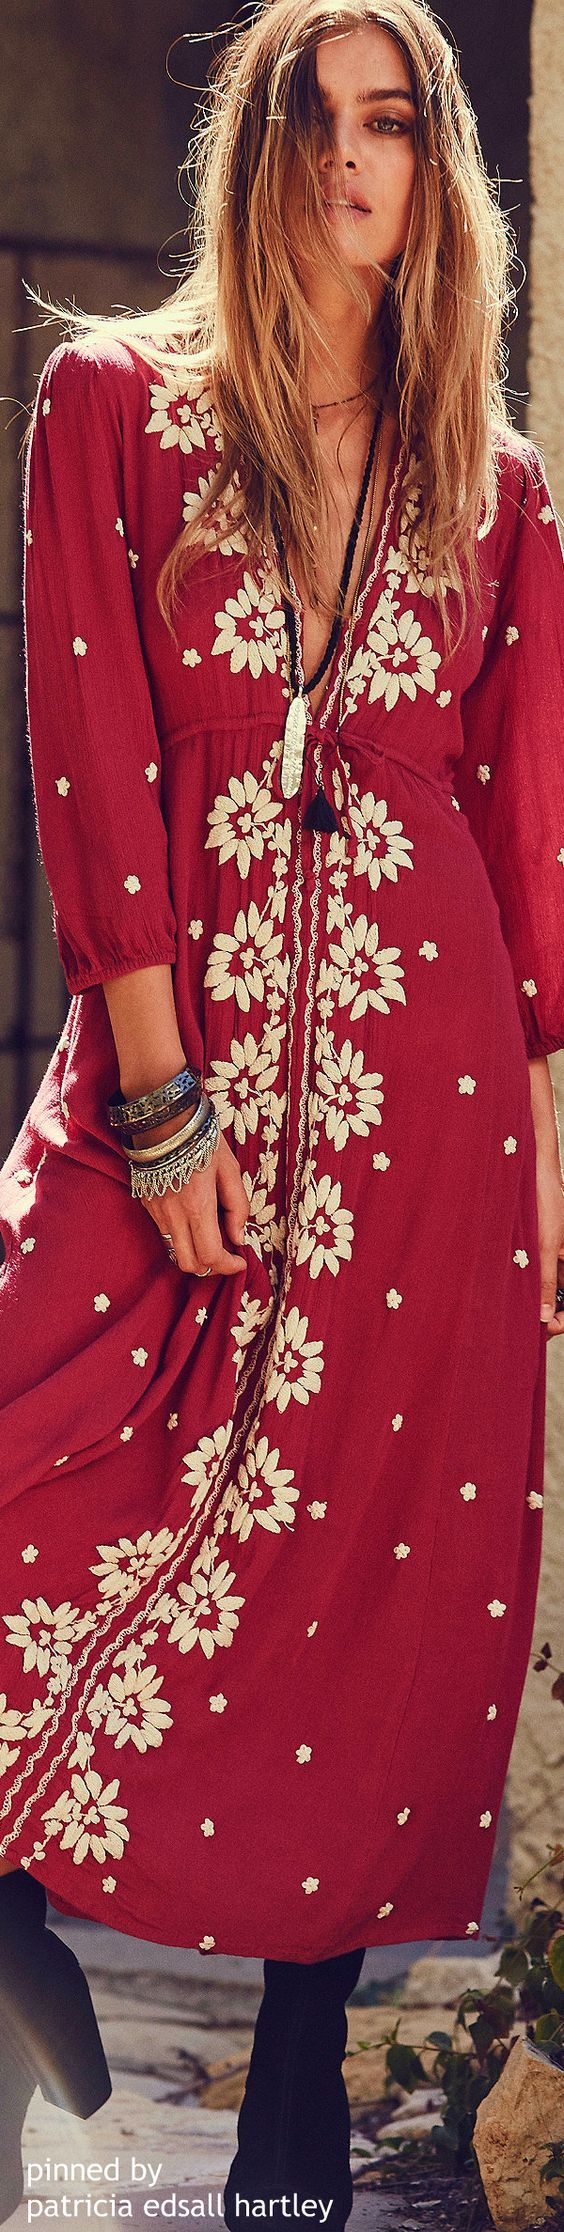 Zaimara Lifestyle :: Bohemian Love :: Keep Positive :: Festival Outfits :: Summer Vibes :: Gypsy Soul :: Style Fashion :: Boho Chic :: Beach + Sun + Palms + Ocean :: Ethnic + Tribal :: #zaimaraglobal